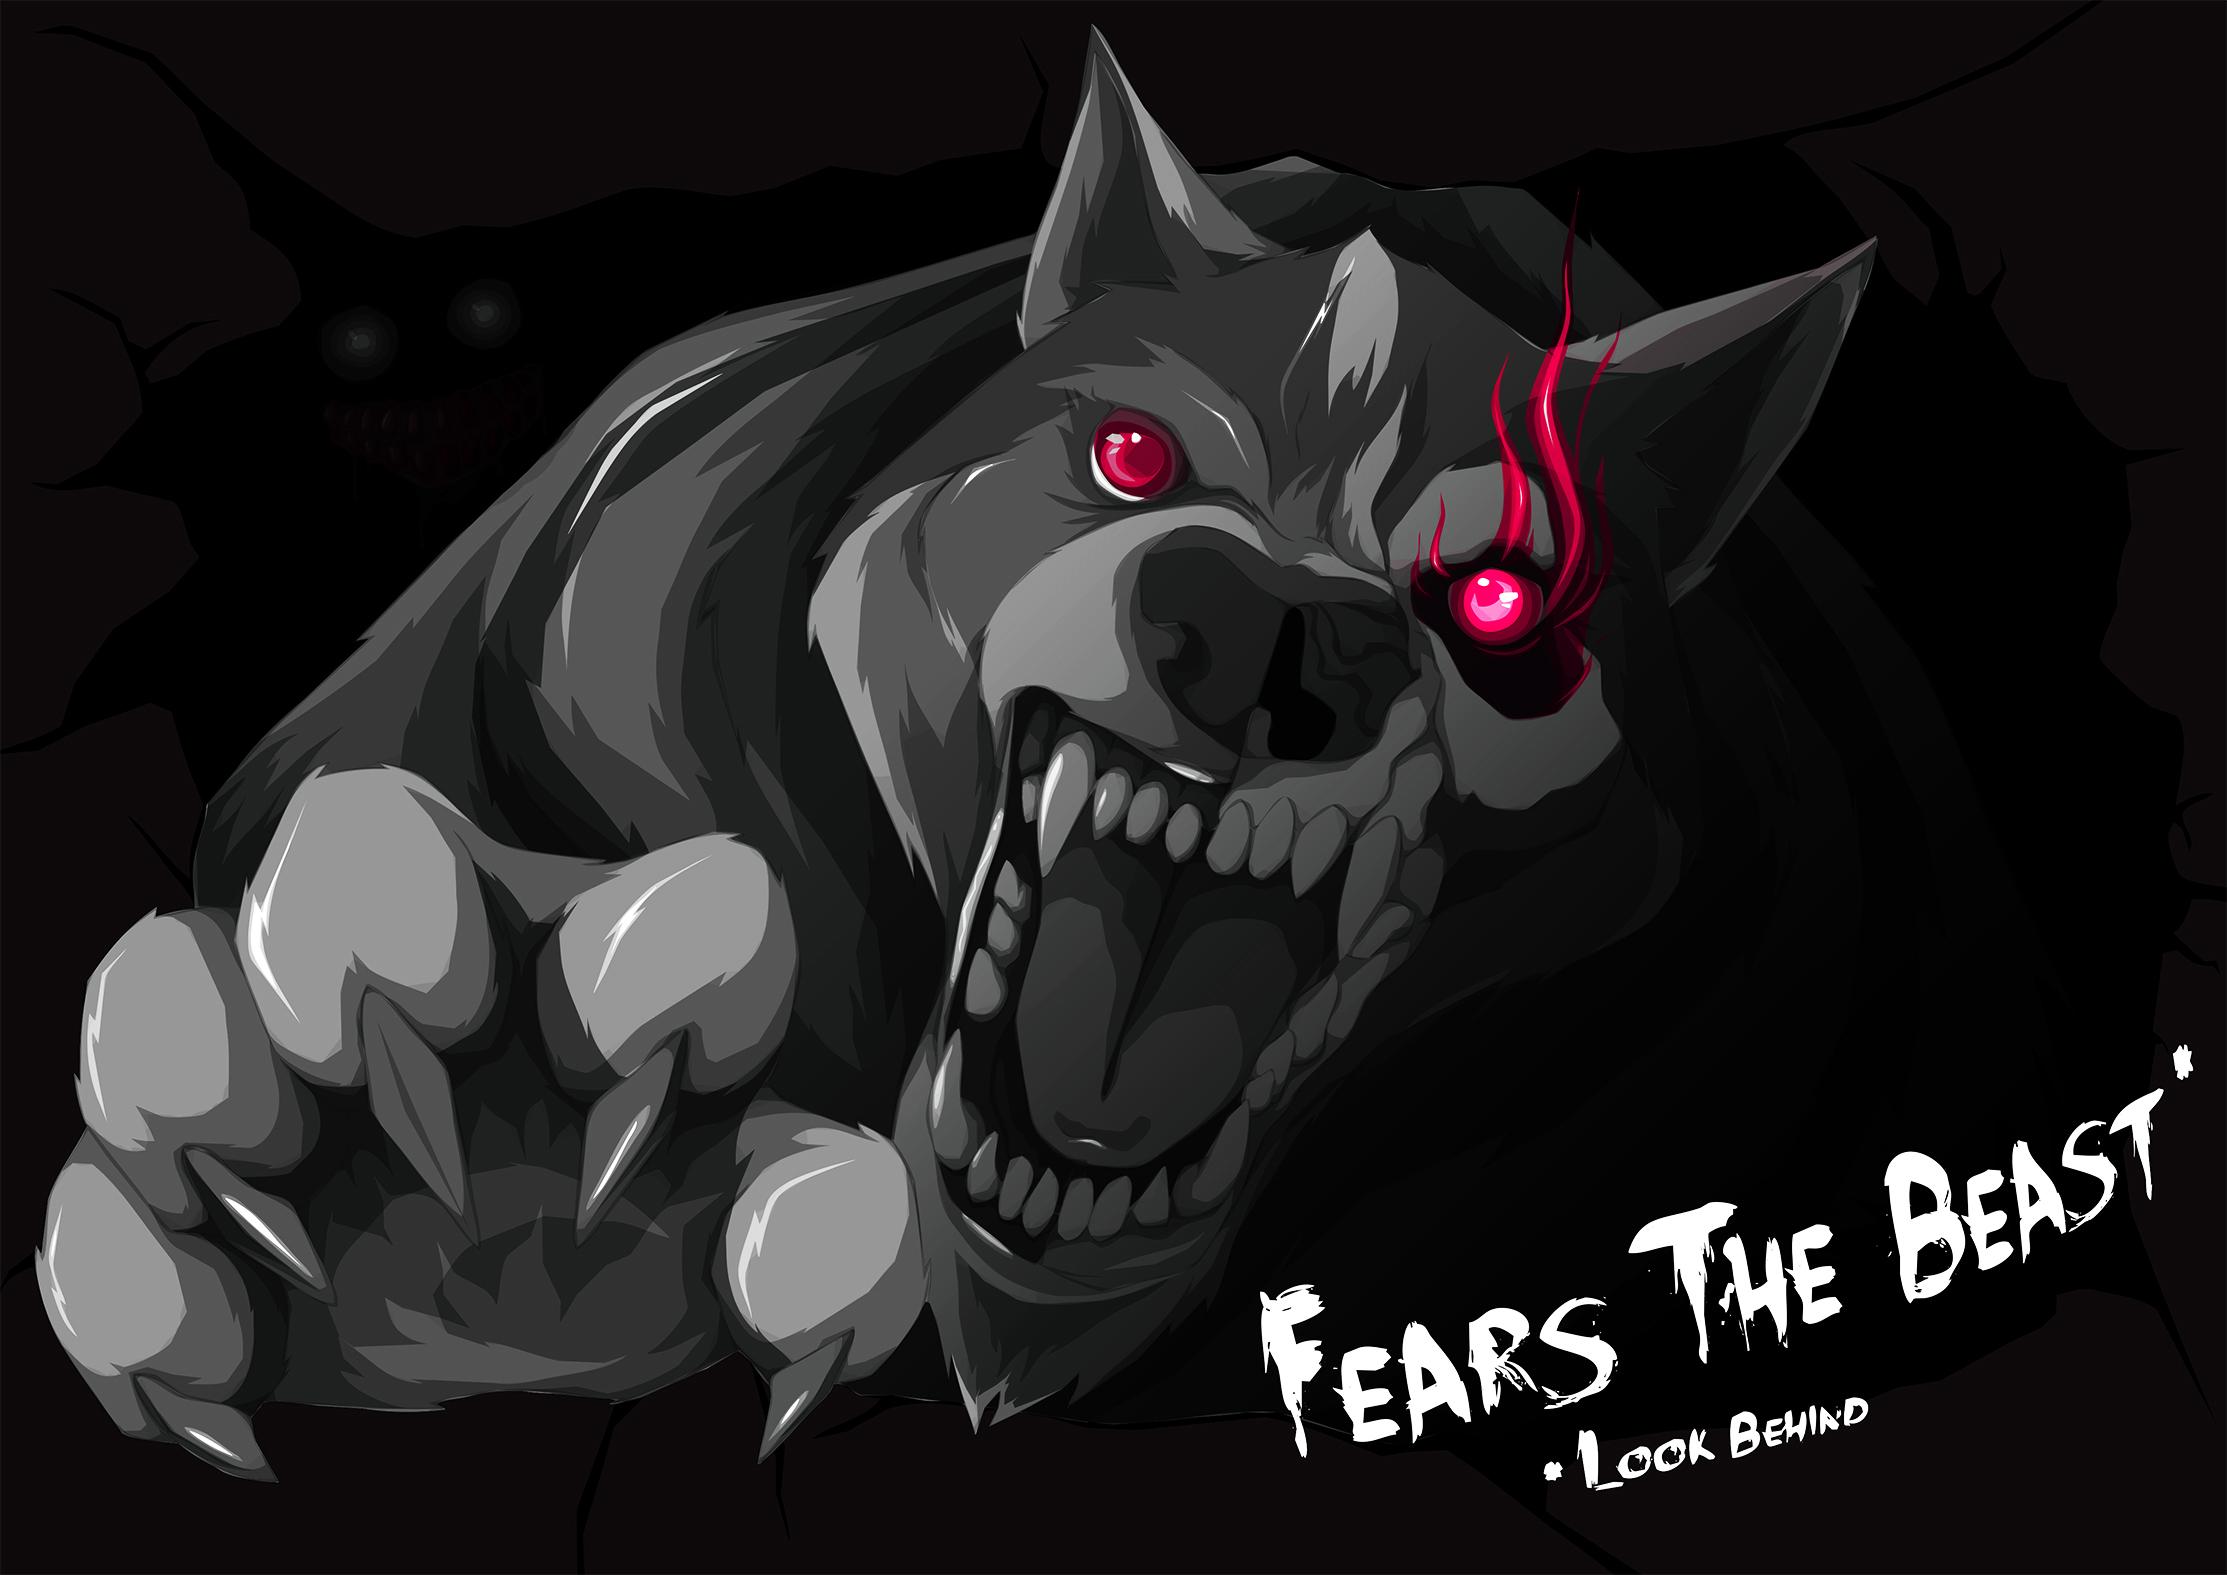 Fears the Beast